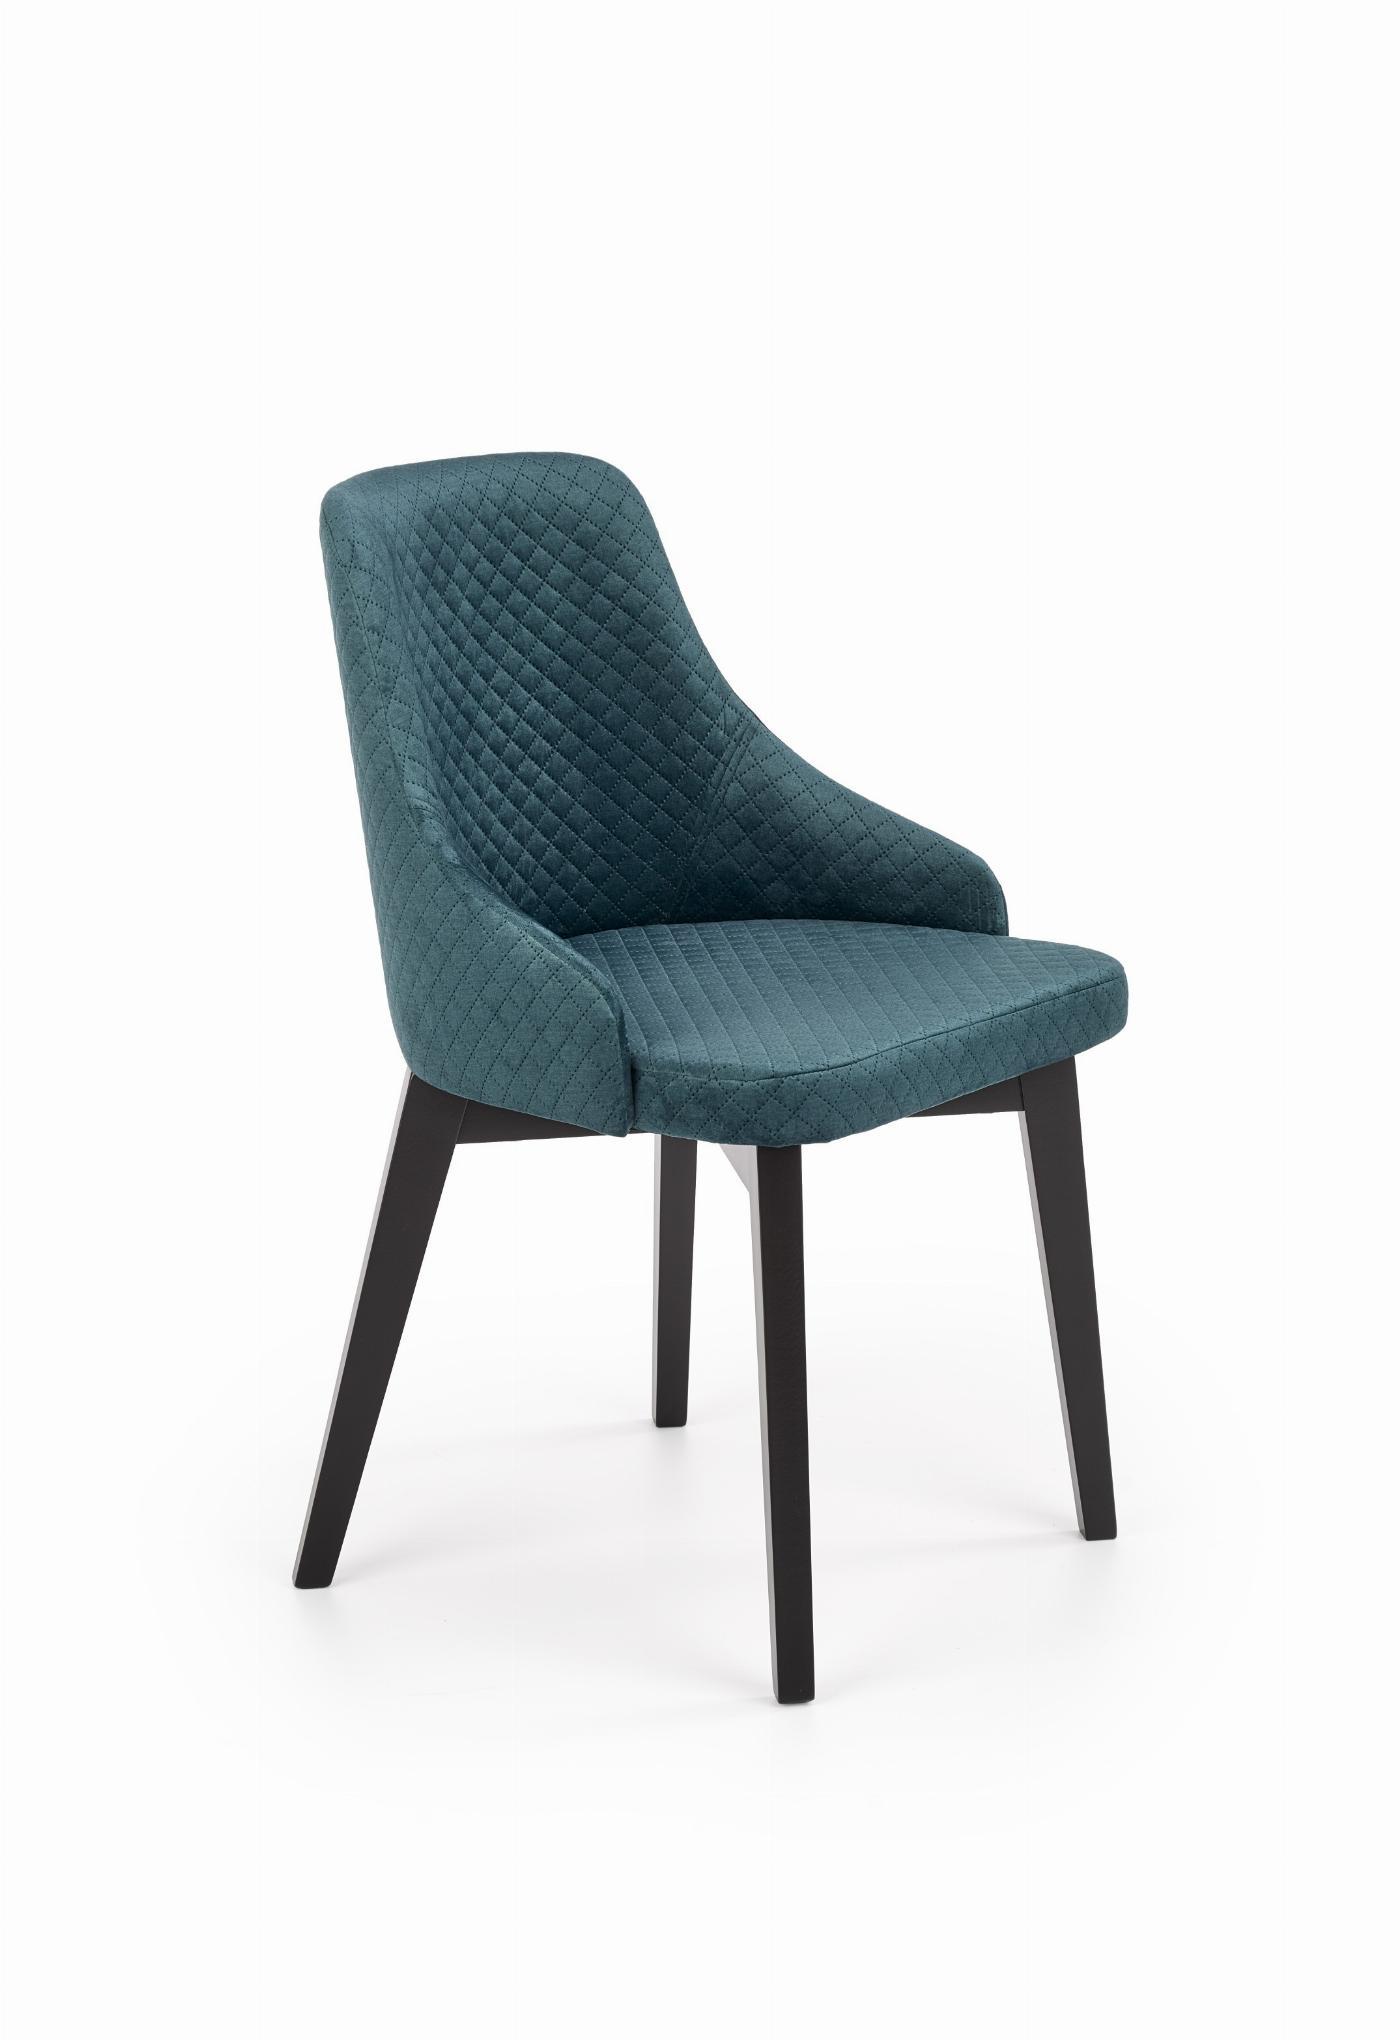 TOLEDO 3 krzesło czarny / tap. velvet pikowany Karo 4 - MONOLITH 37 (ciemny zielony) (1p=1szt)